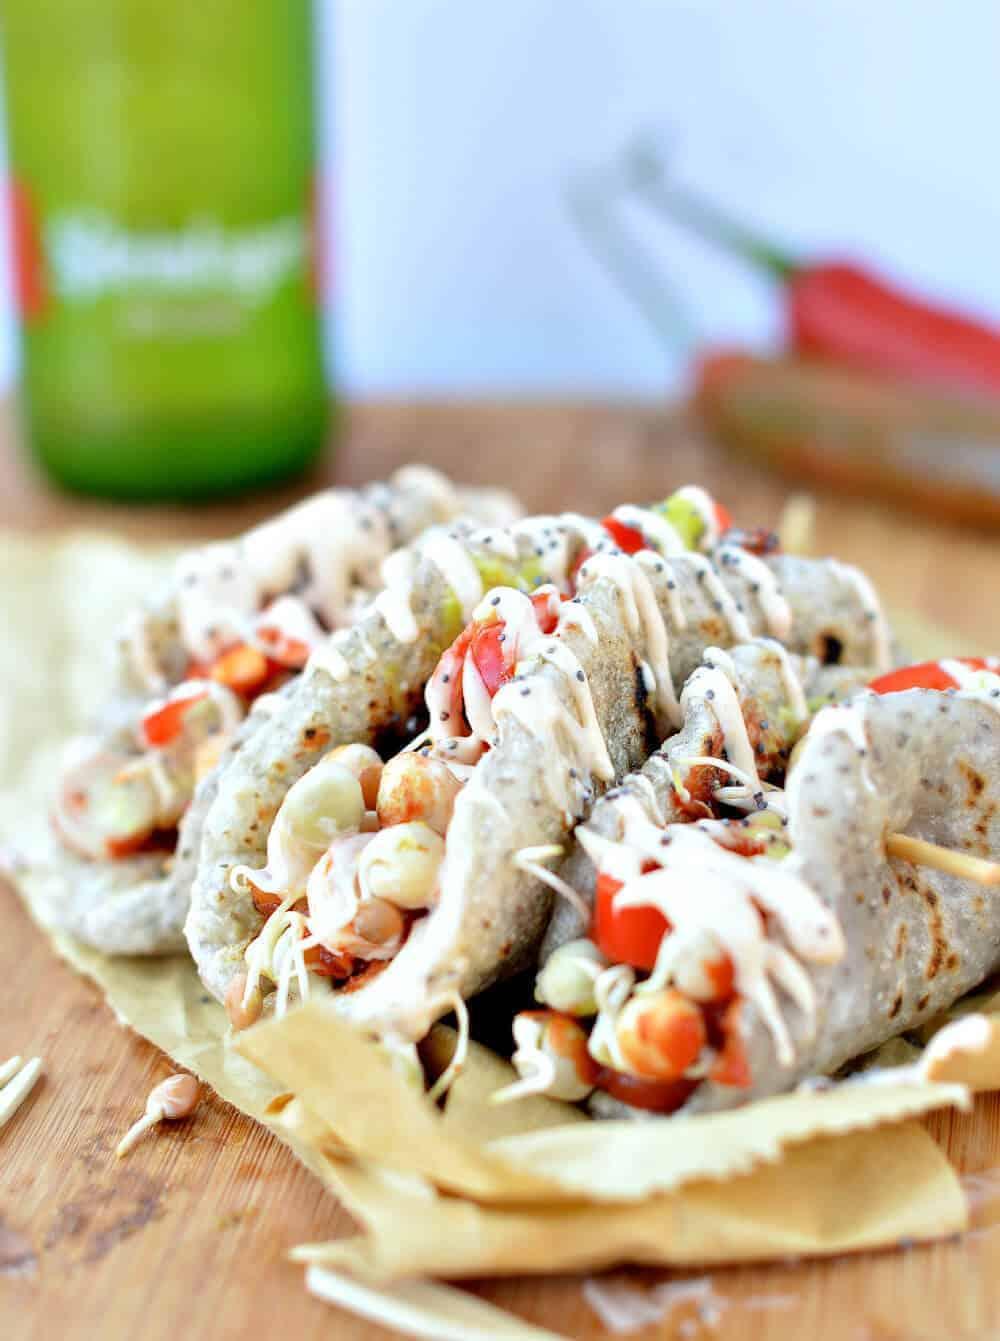 Paleo Tortillas with Chia Seeds (Vegan, Gluten Free)